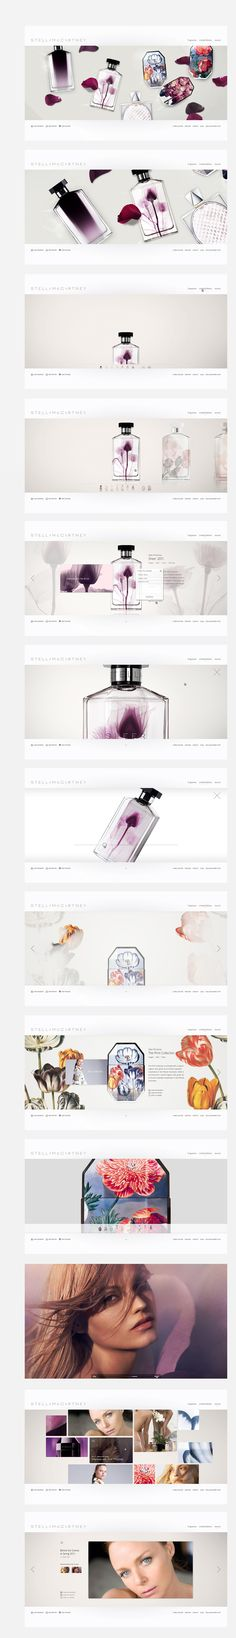 Stella McCartney Fragrances